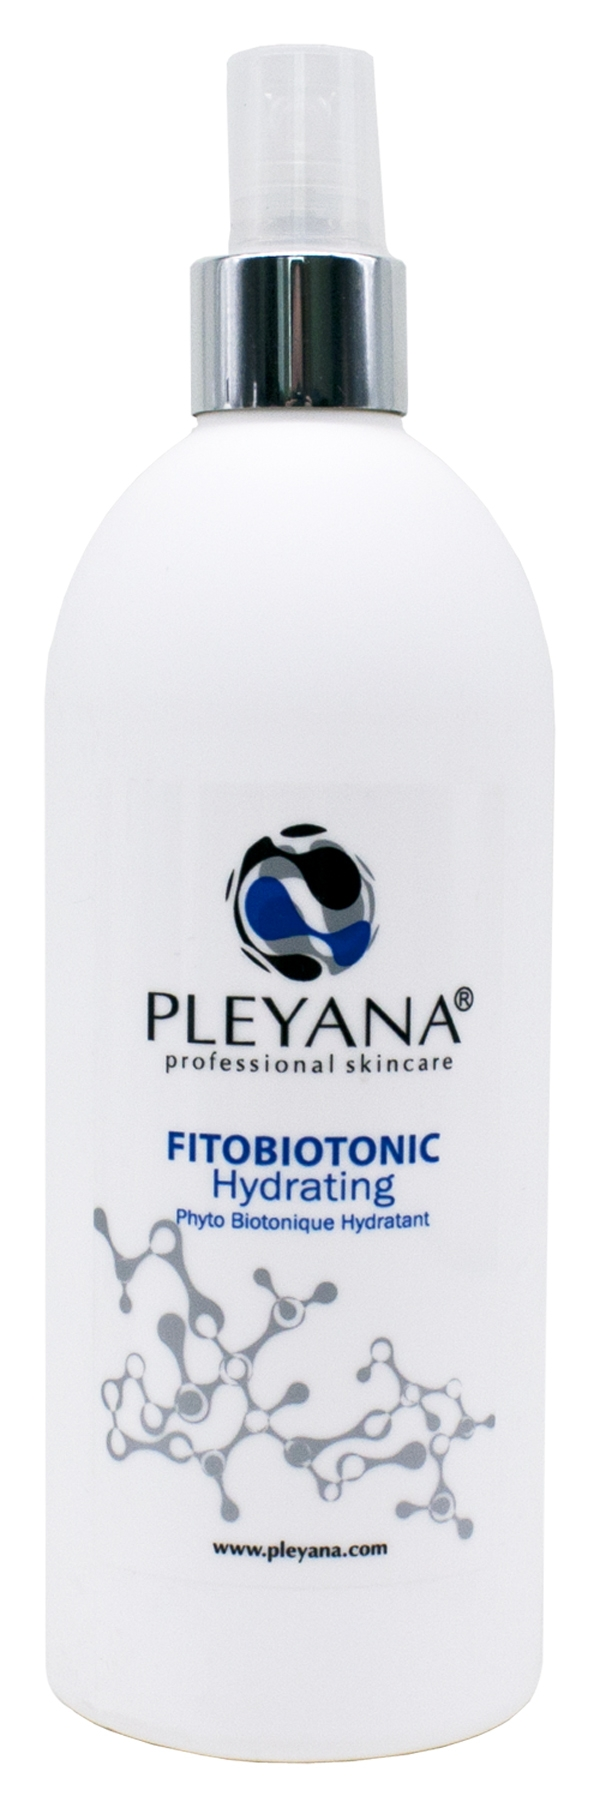 Pleyana Фитобиотоник Увлажняющий, 200 мл